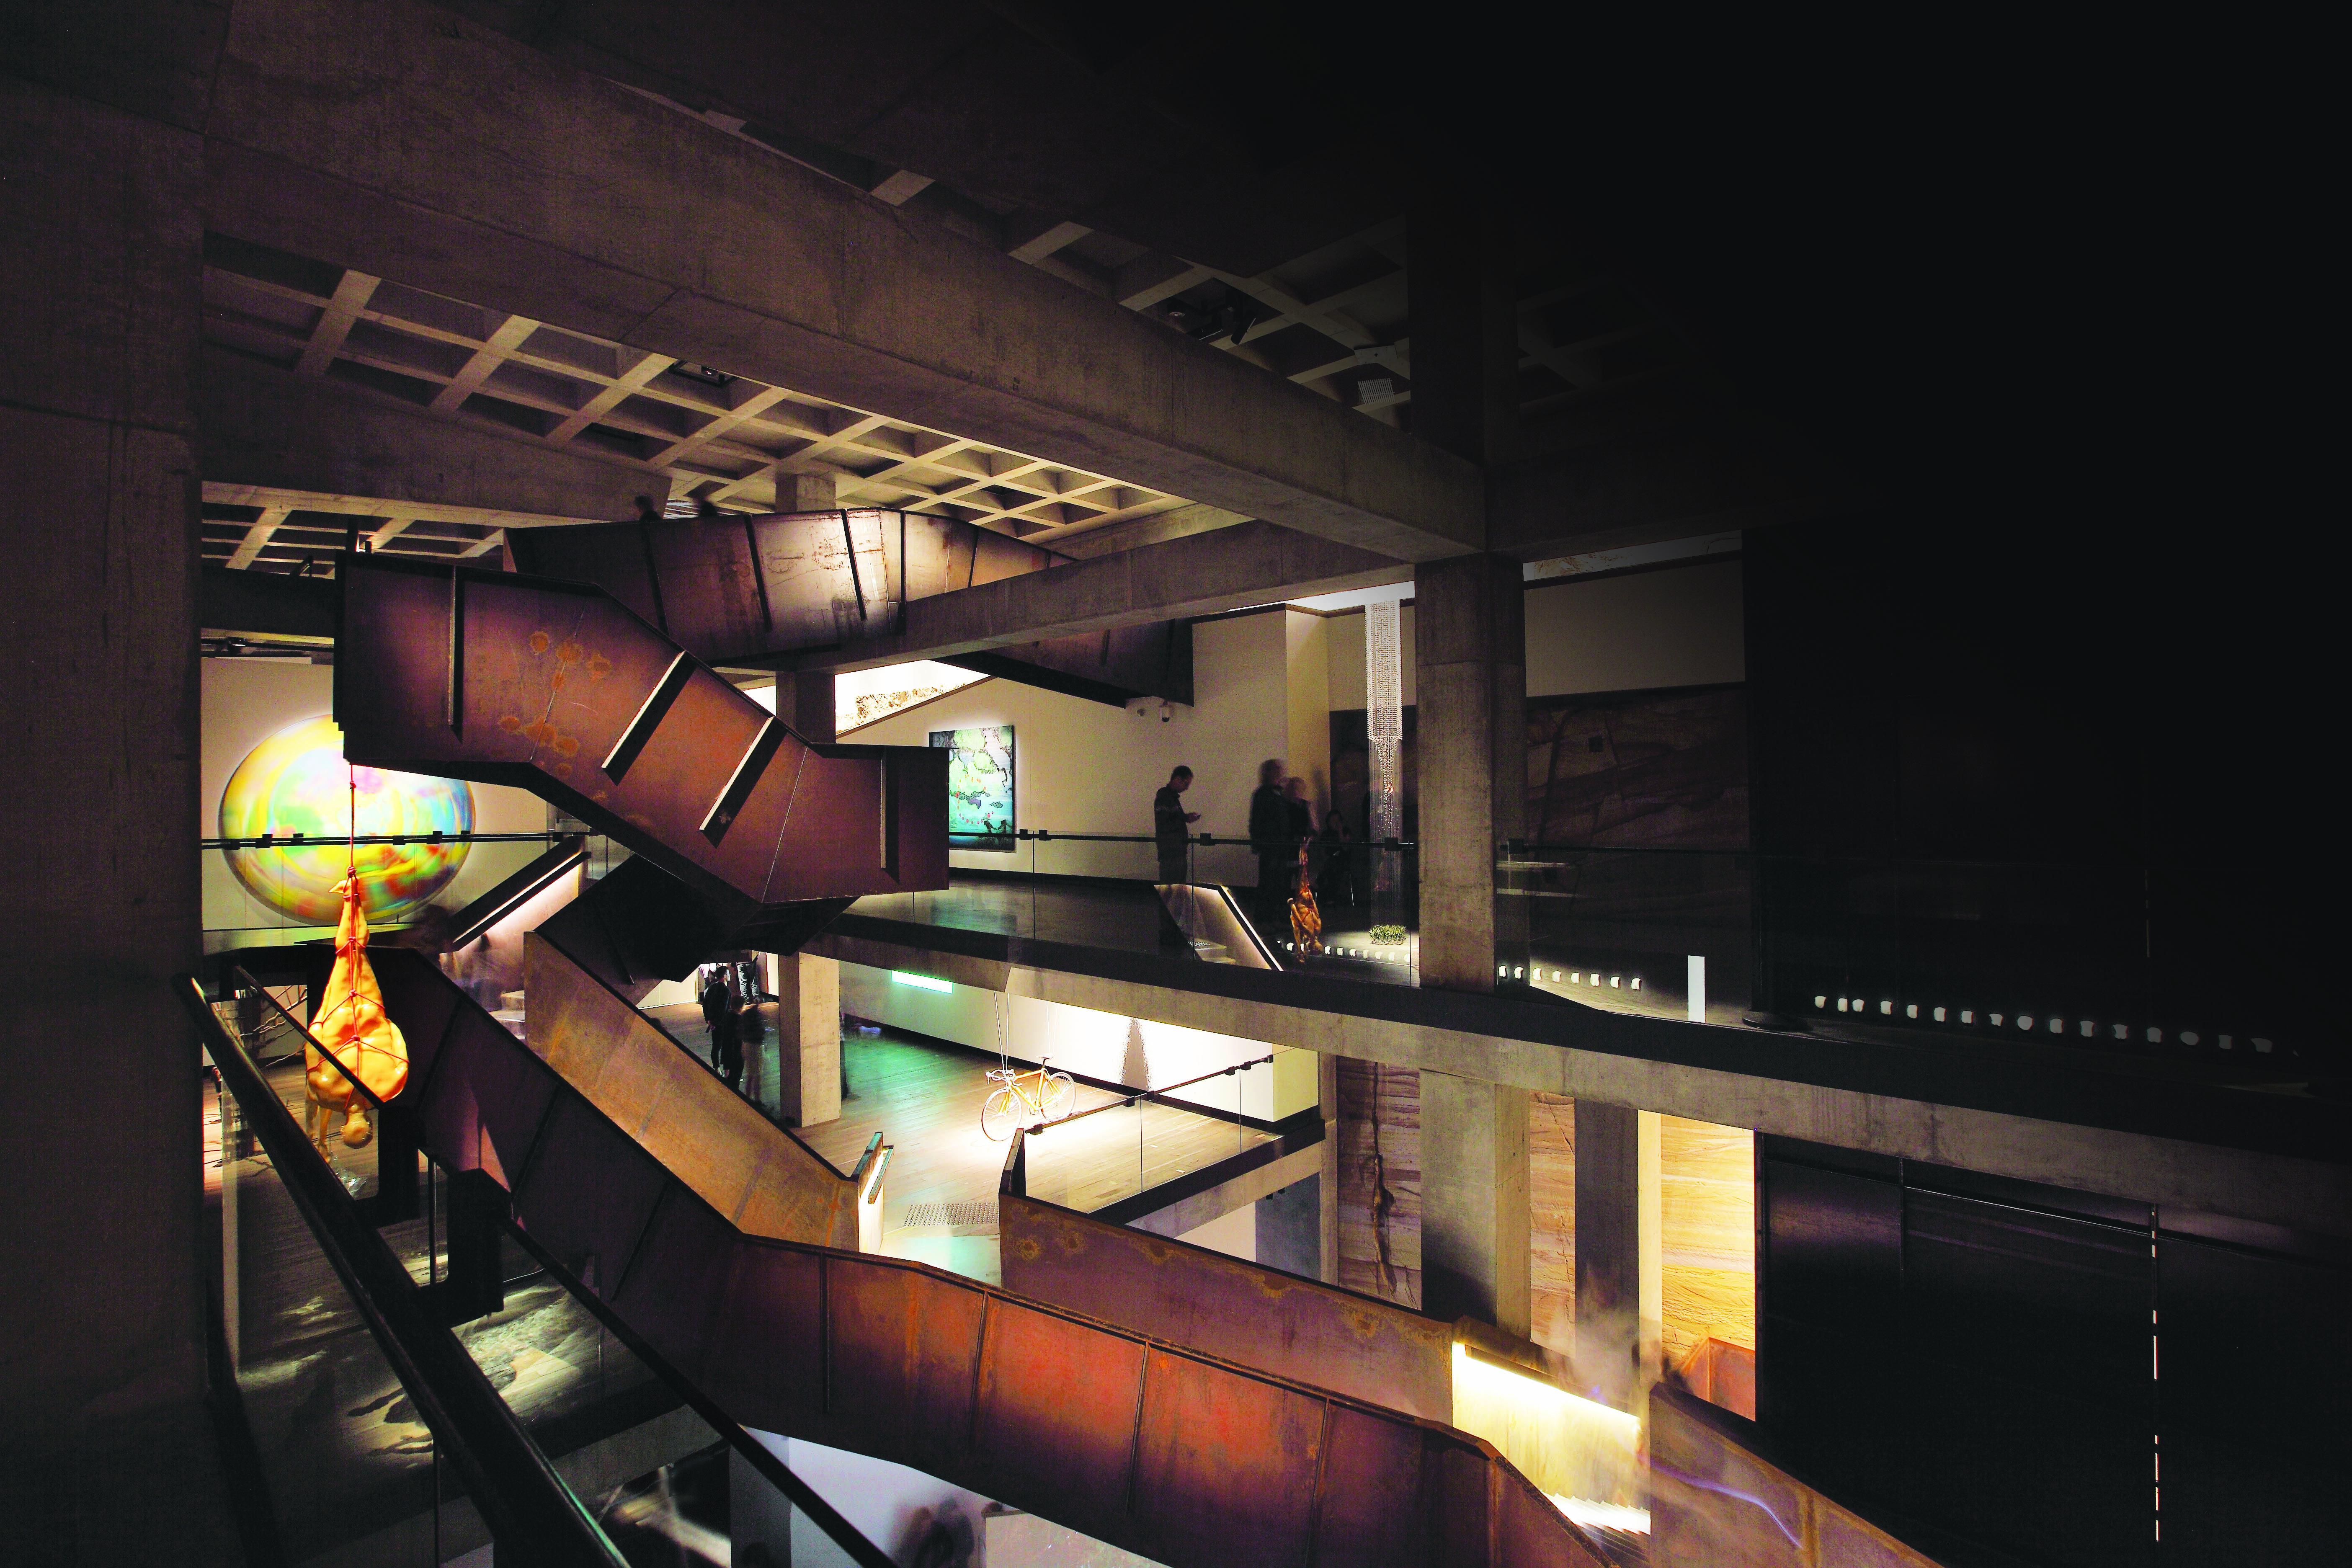 Corten Stairwell & surrounding artworks inside MONA, Hobart. Image courtesy of MONA.